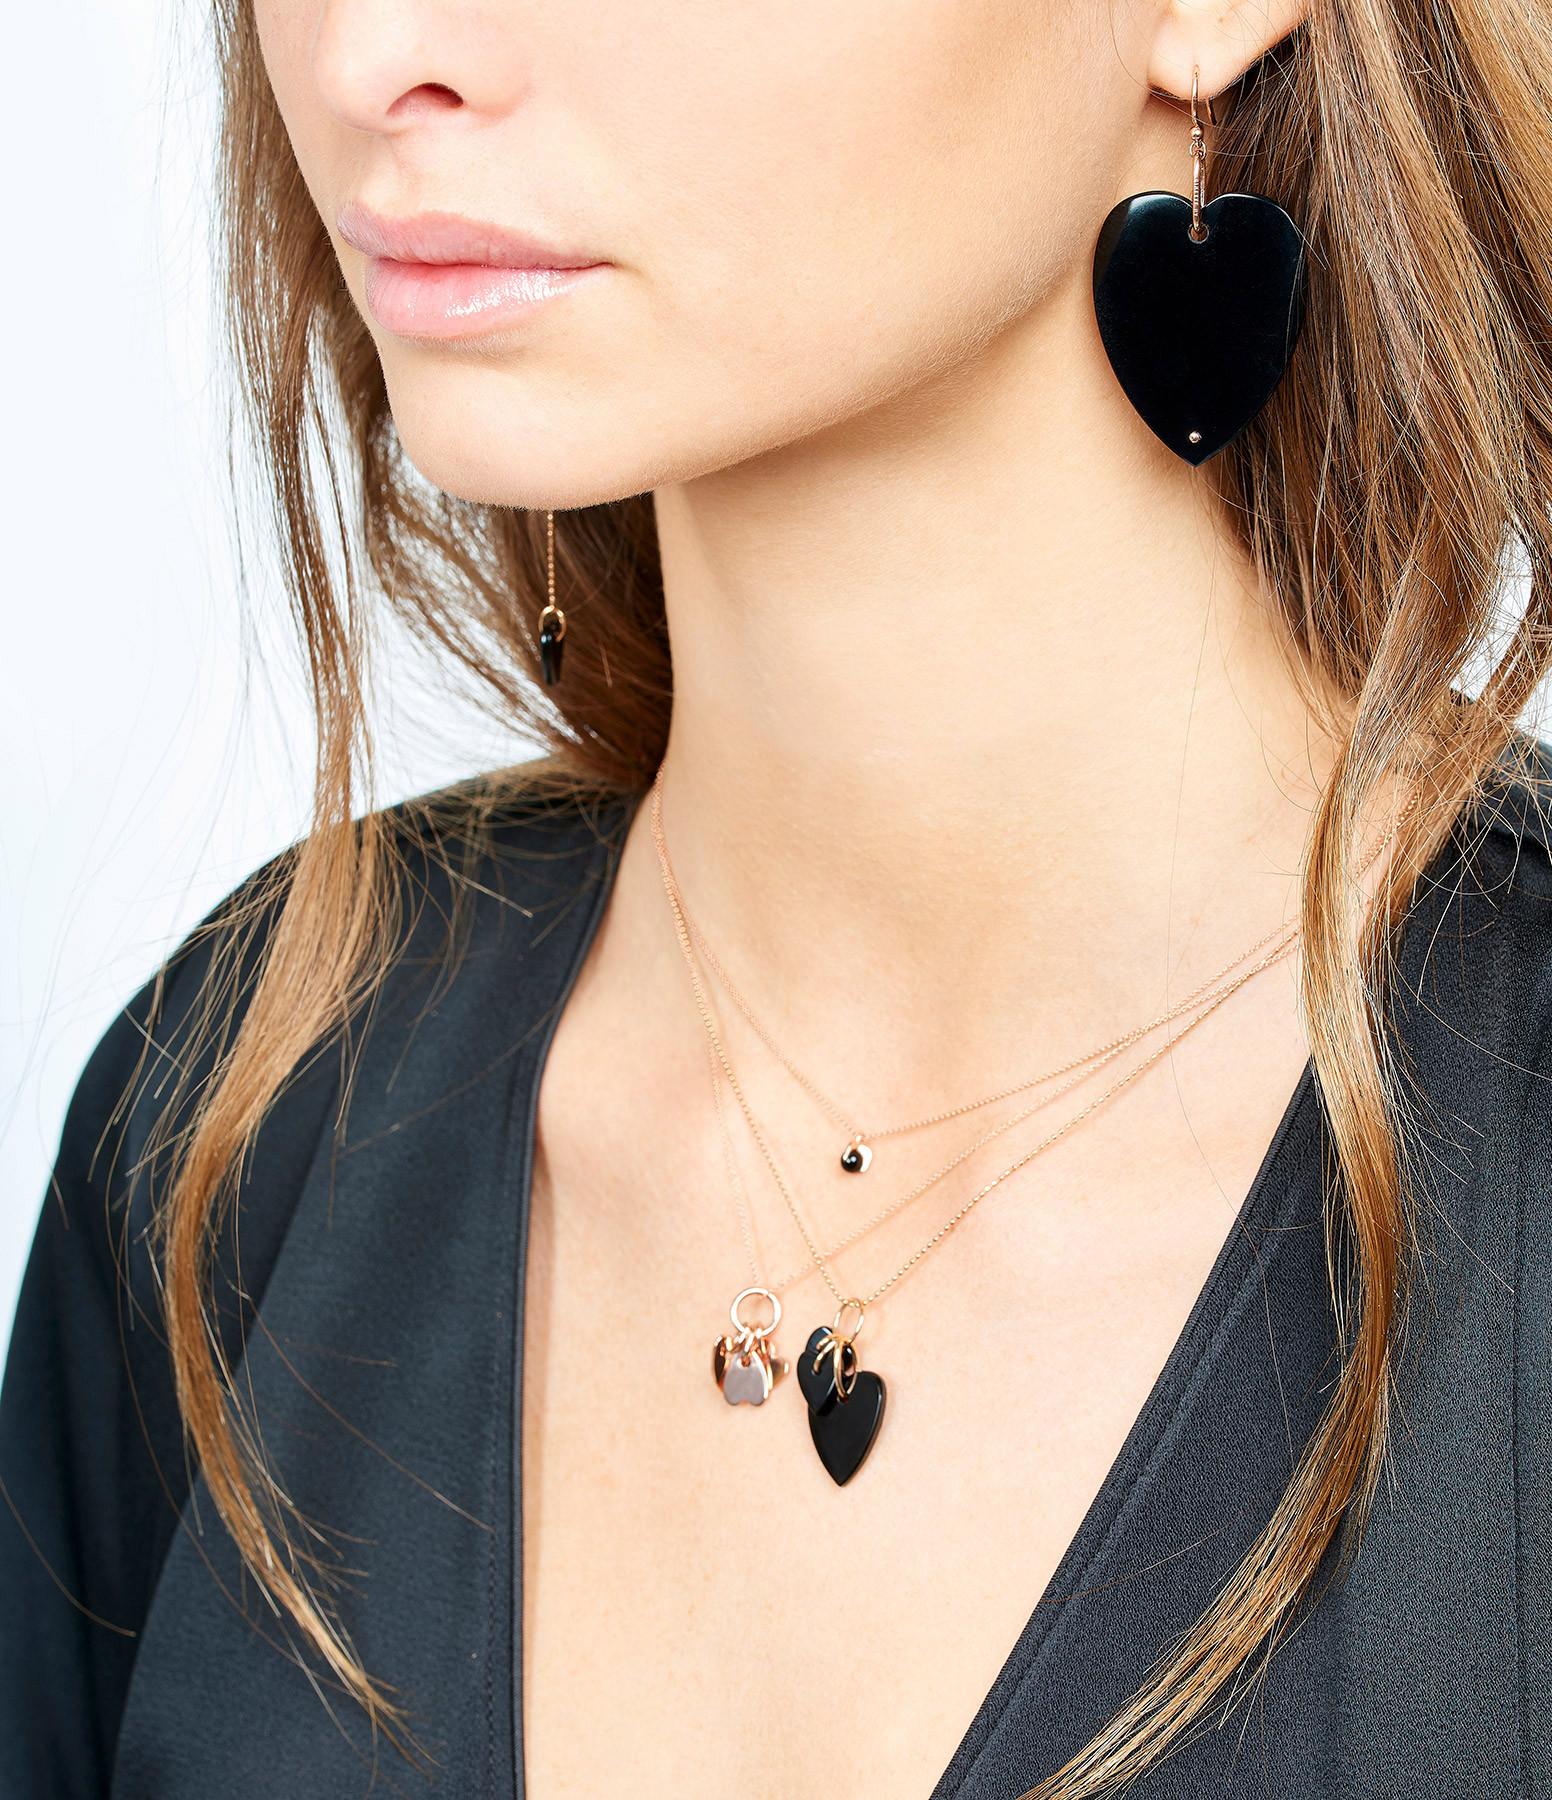 GINETTE_NY - Boucle d'oreille Angèle Jumbo Coeur Onyx (unité)